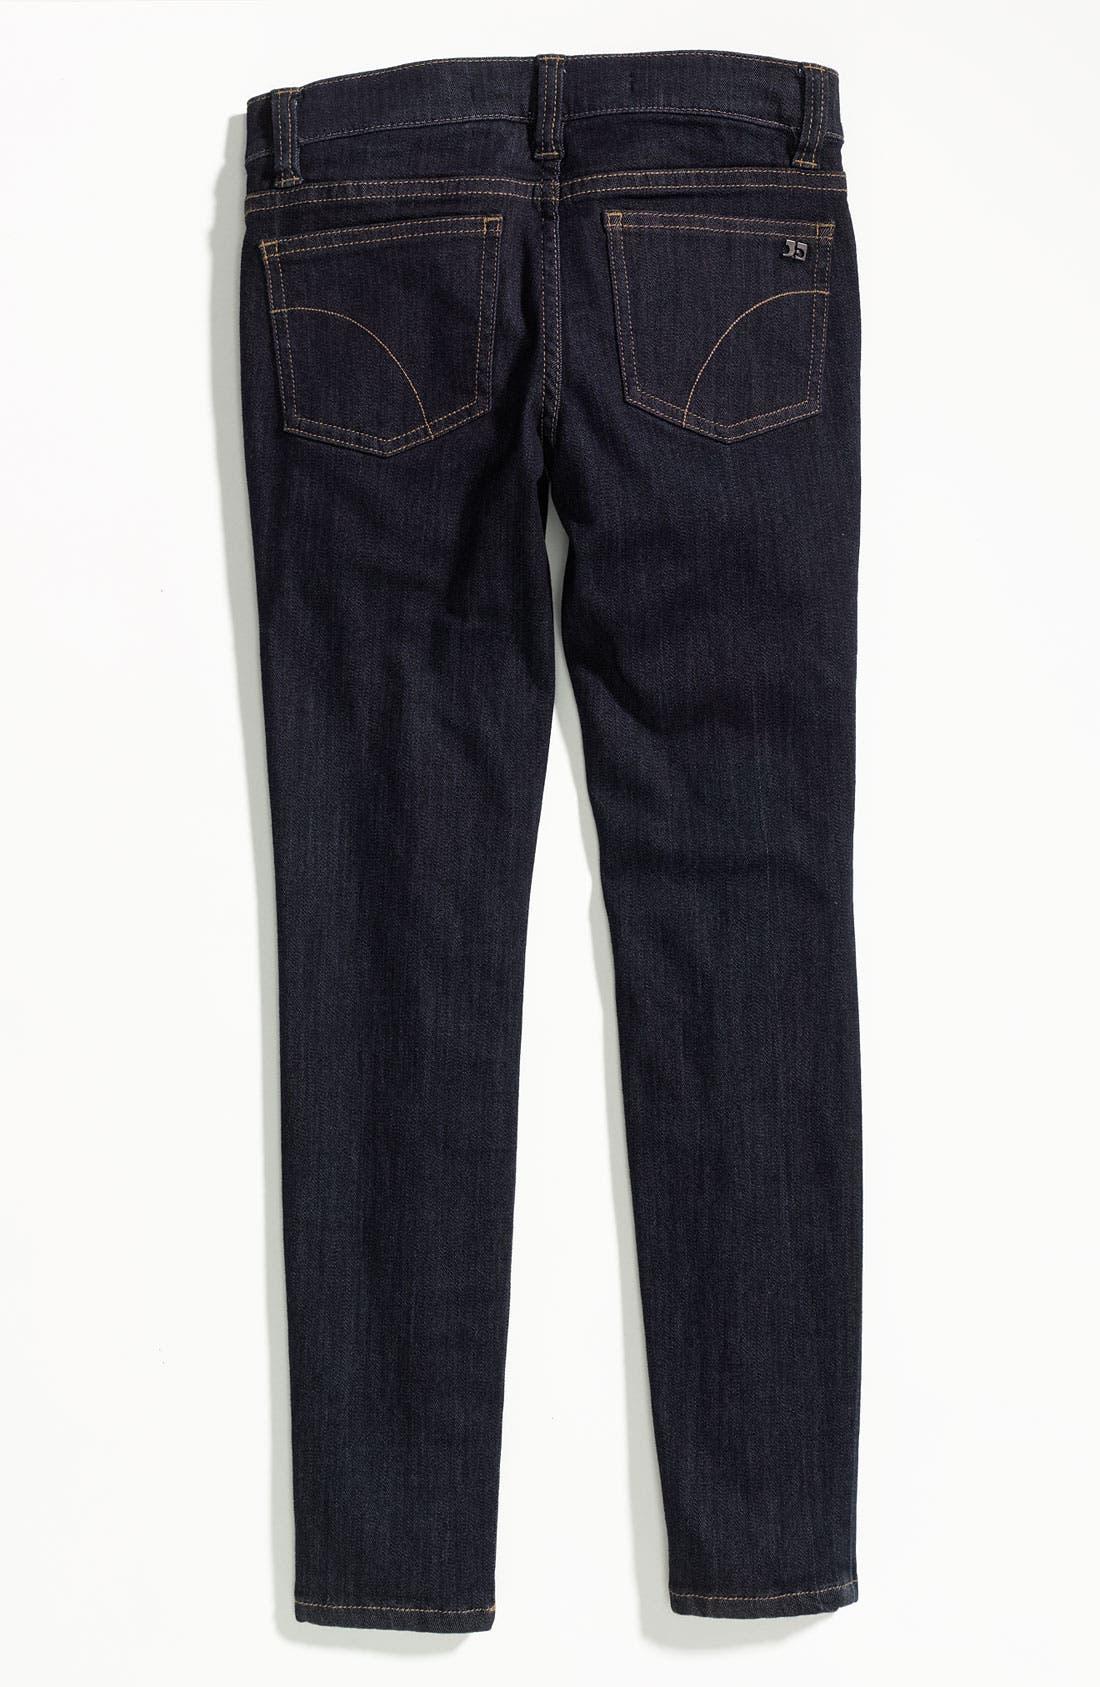 Main Image - Joe's 'Supersmooth' Super Skinny Jeans (Big Girls)